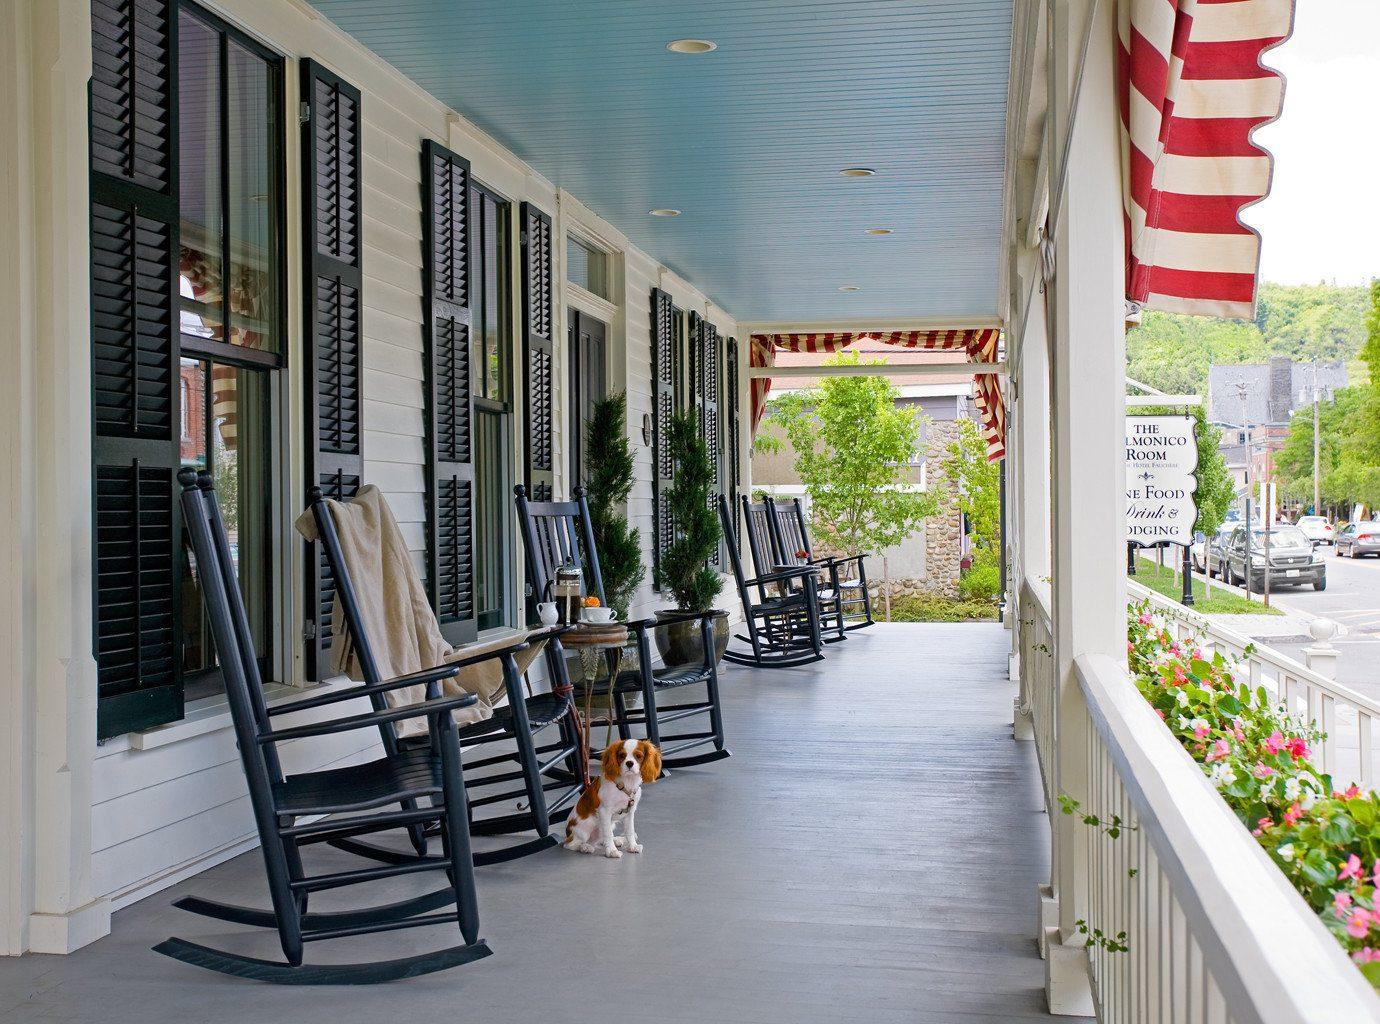 Boutique Deck Lounge Modern Patio property condominium home porch